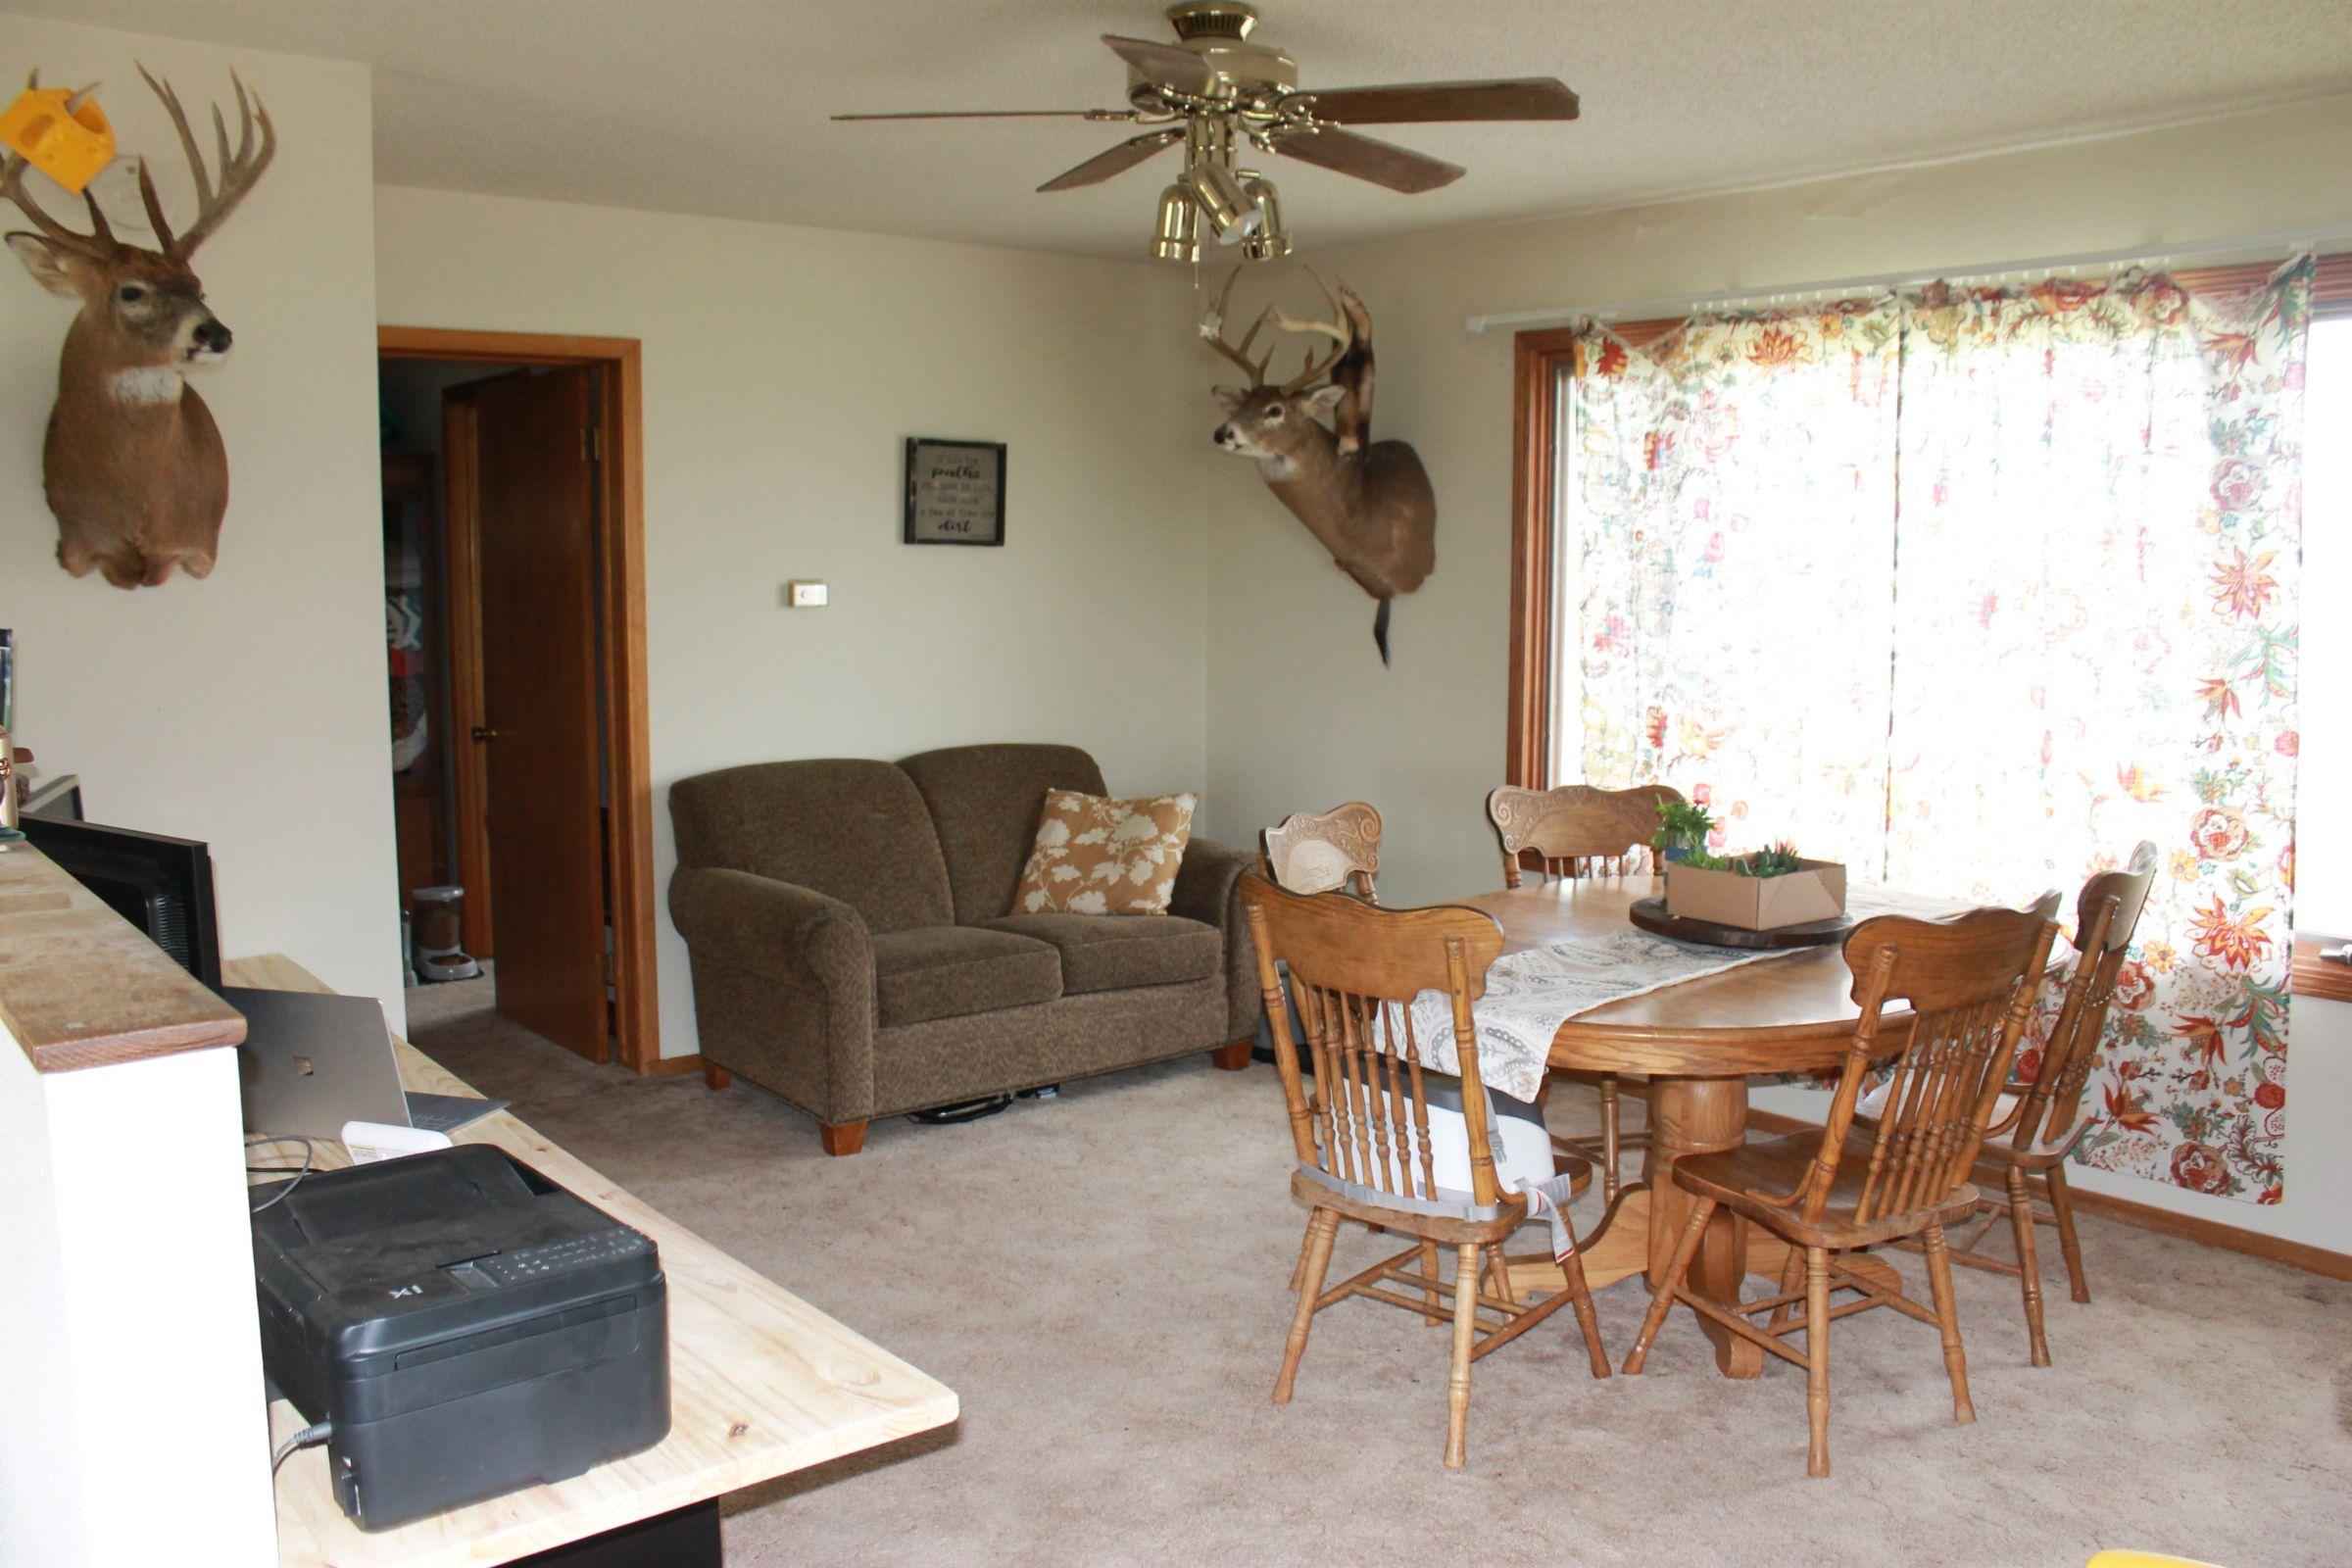 residential-development-land-warren-county-iowa-38-acres-listing-number-15513-1-2021-05-06-210431.JPG